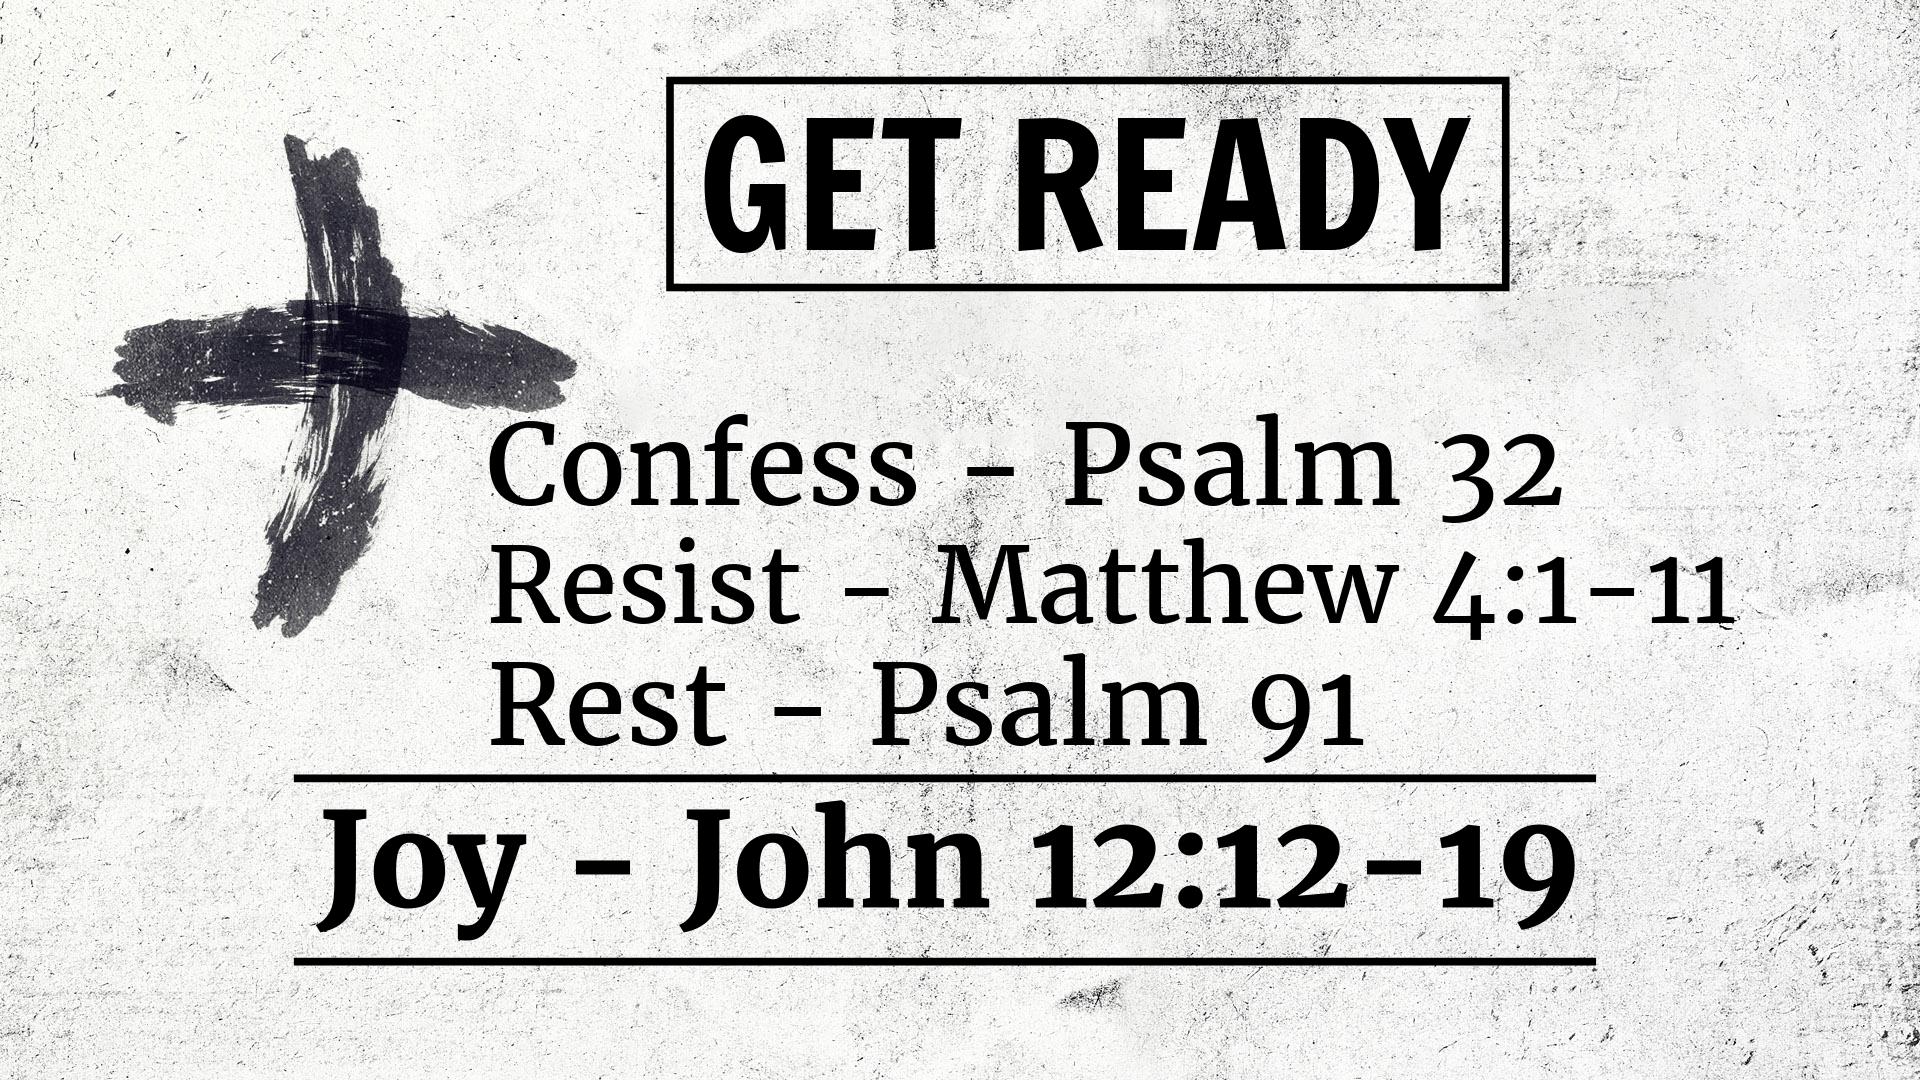 Get Ready - Joy